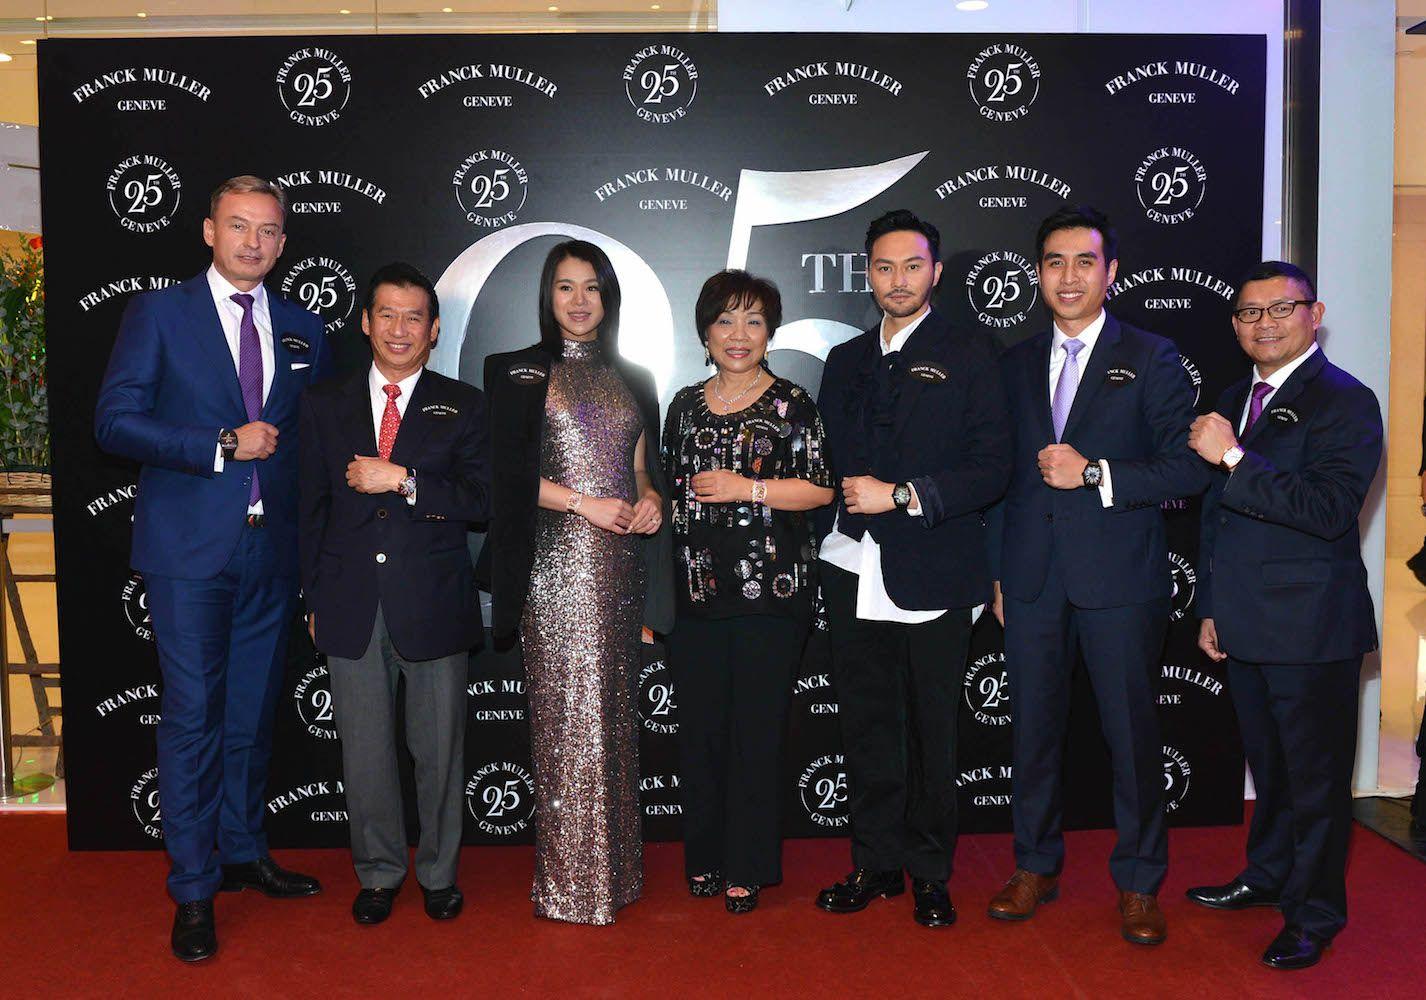 Nicholas Rudaz, Nicholas Chu, Myolie Wu, Pollyanna Chu, Julian Cheung, Kingston Chu, Francis Phua